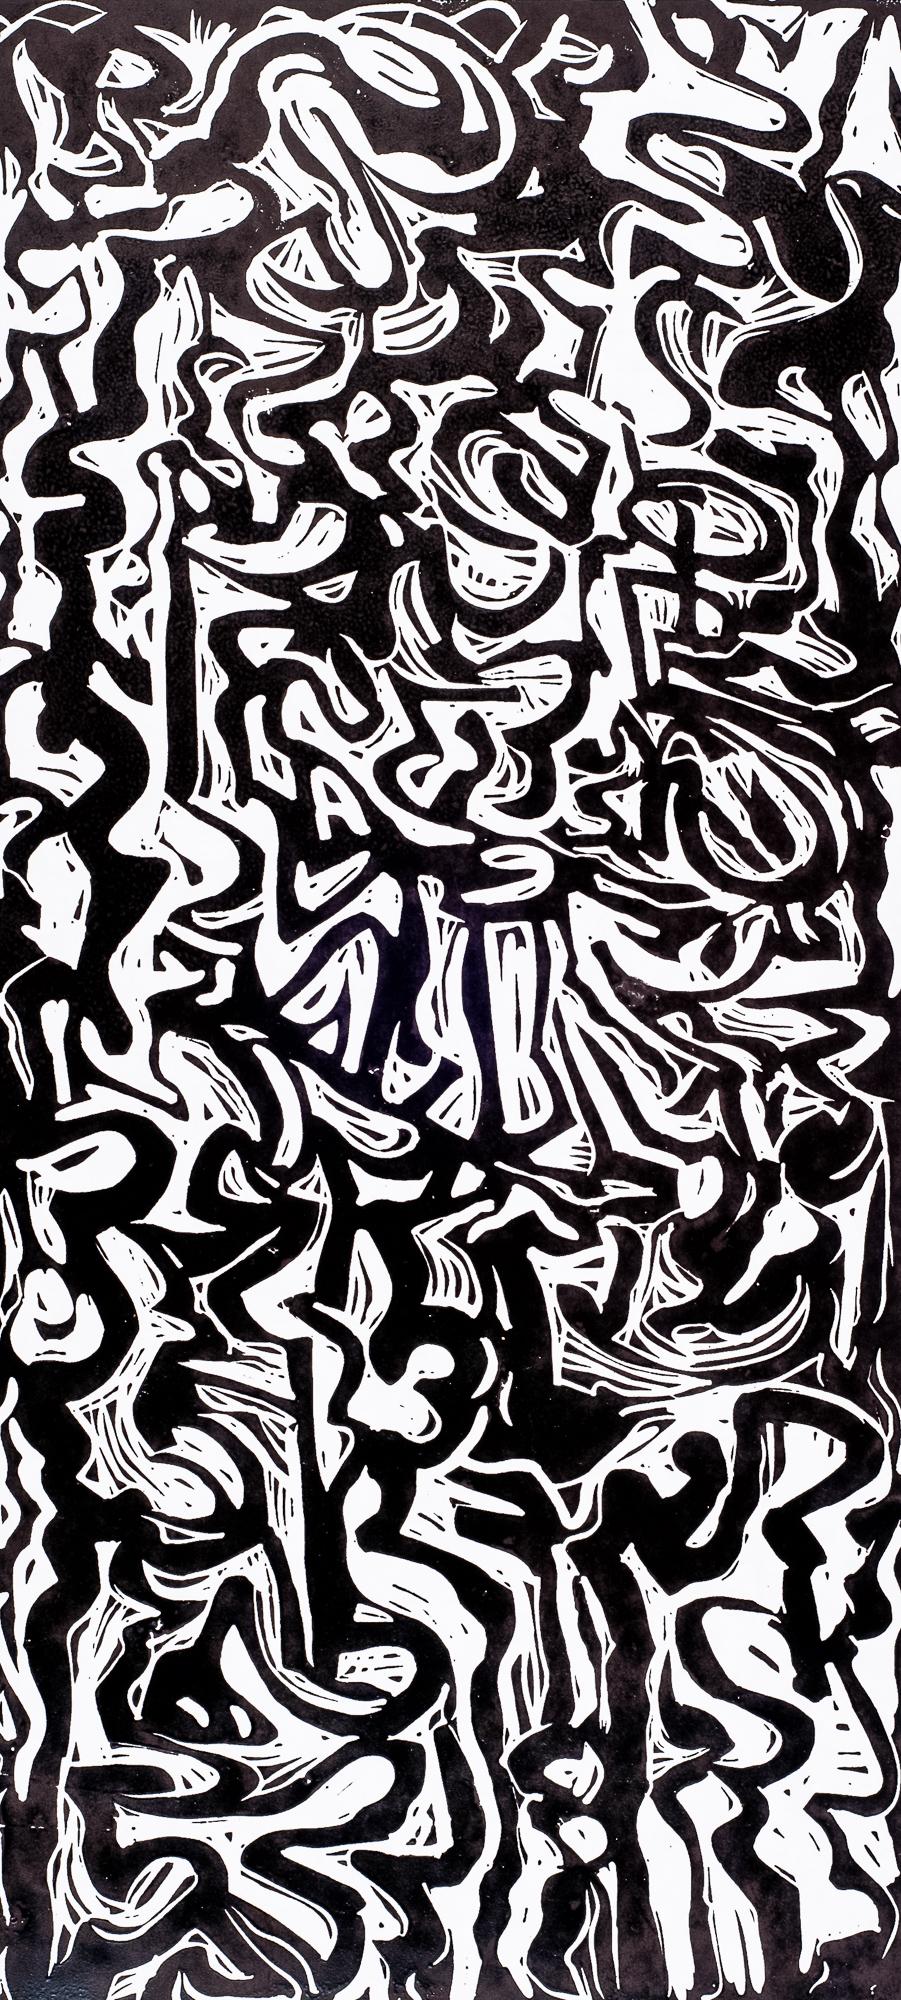 Maze | 22 3/8 x 10 1/4   | 1962